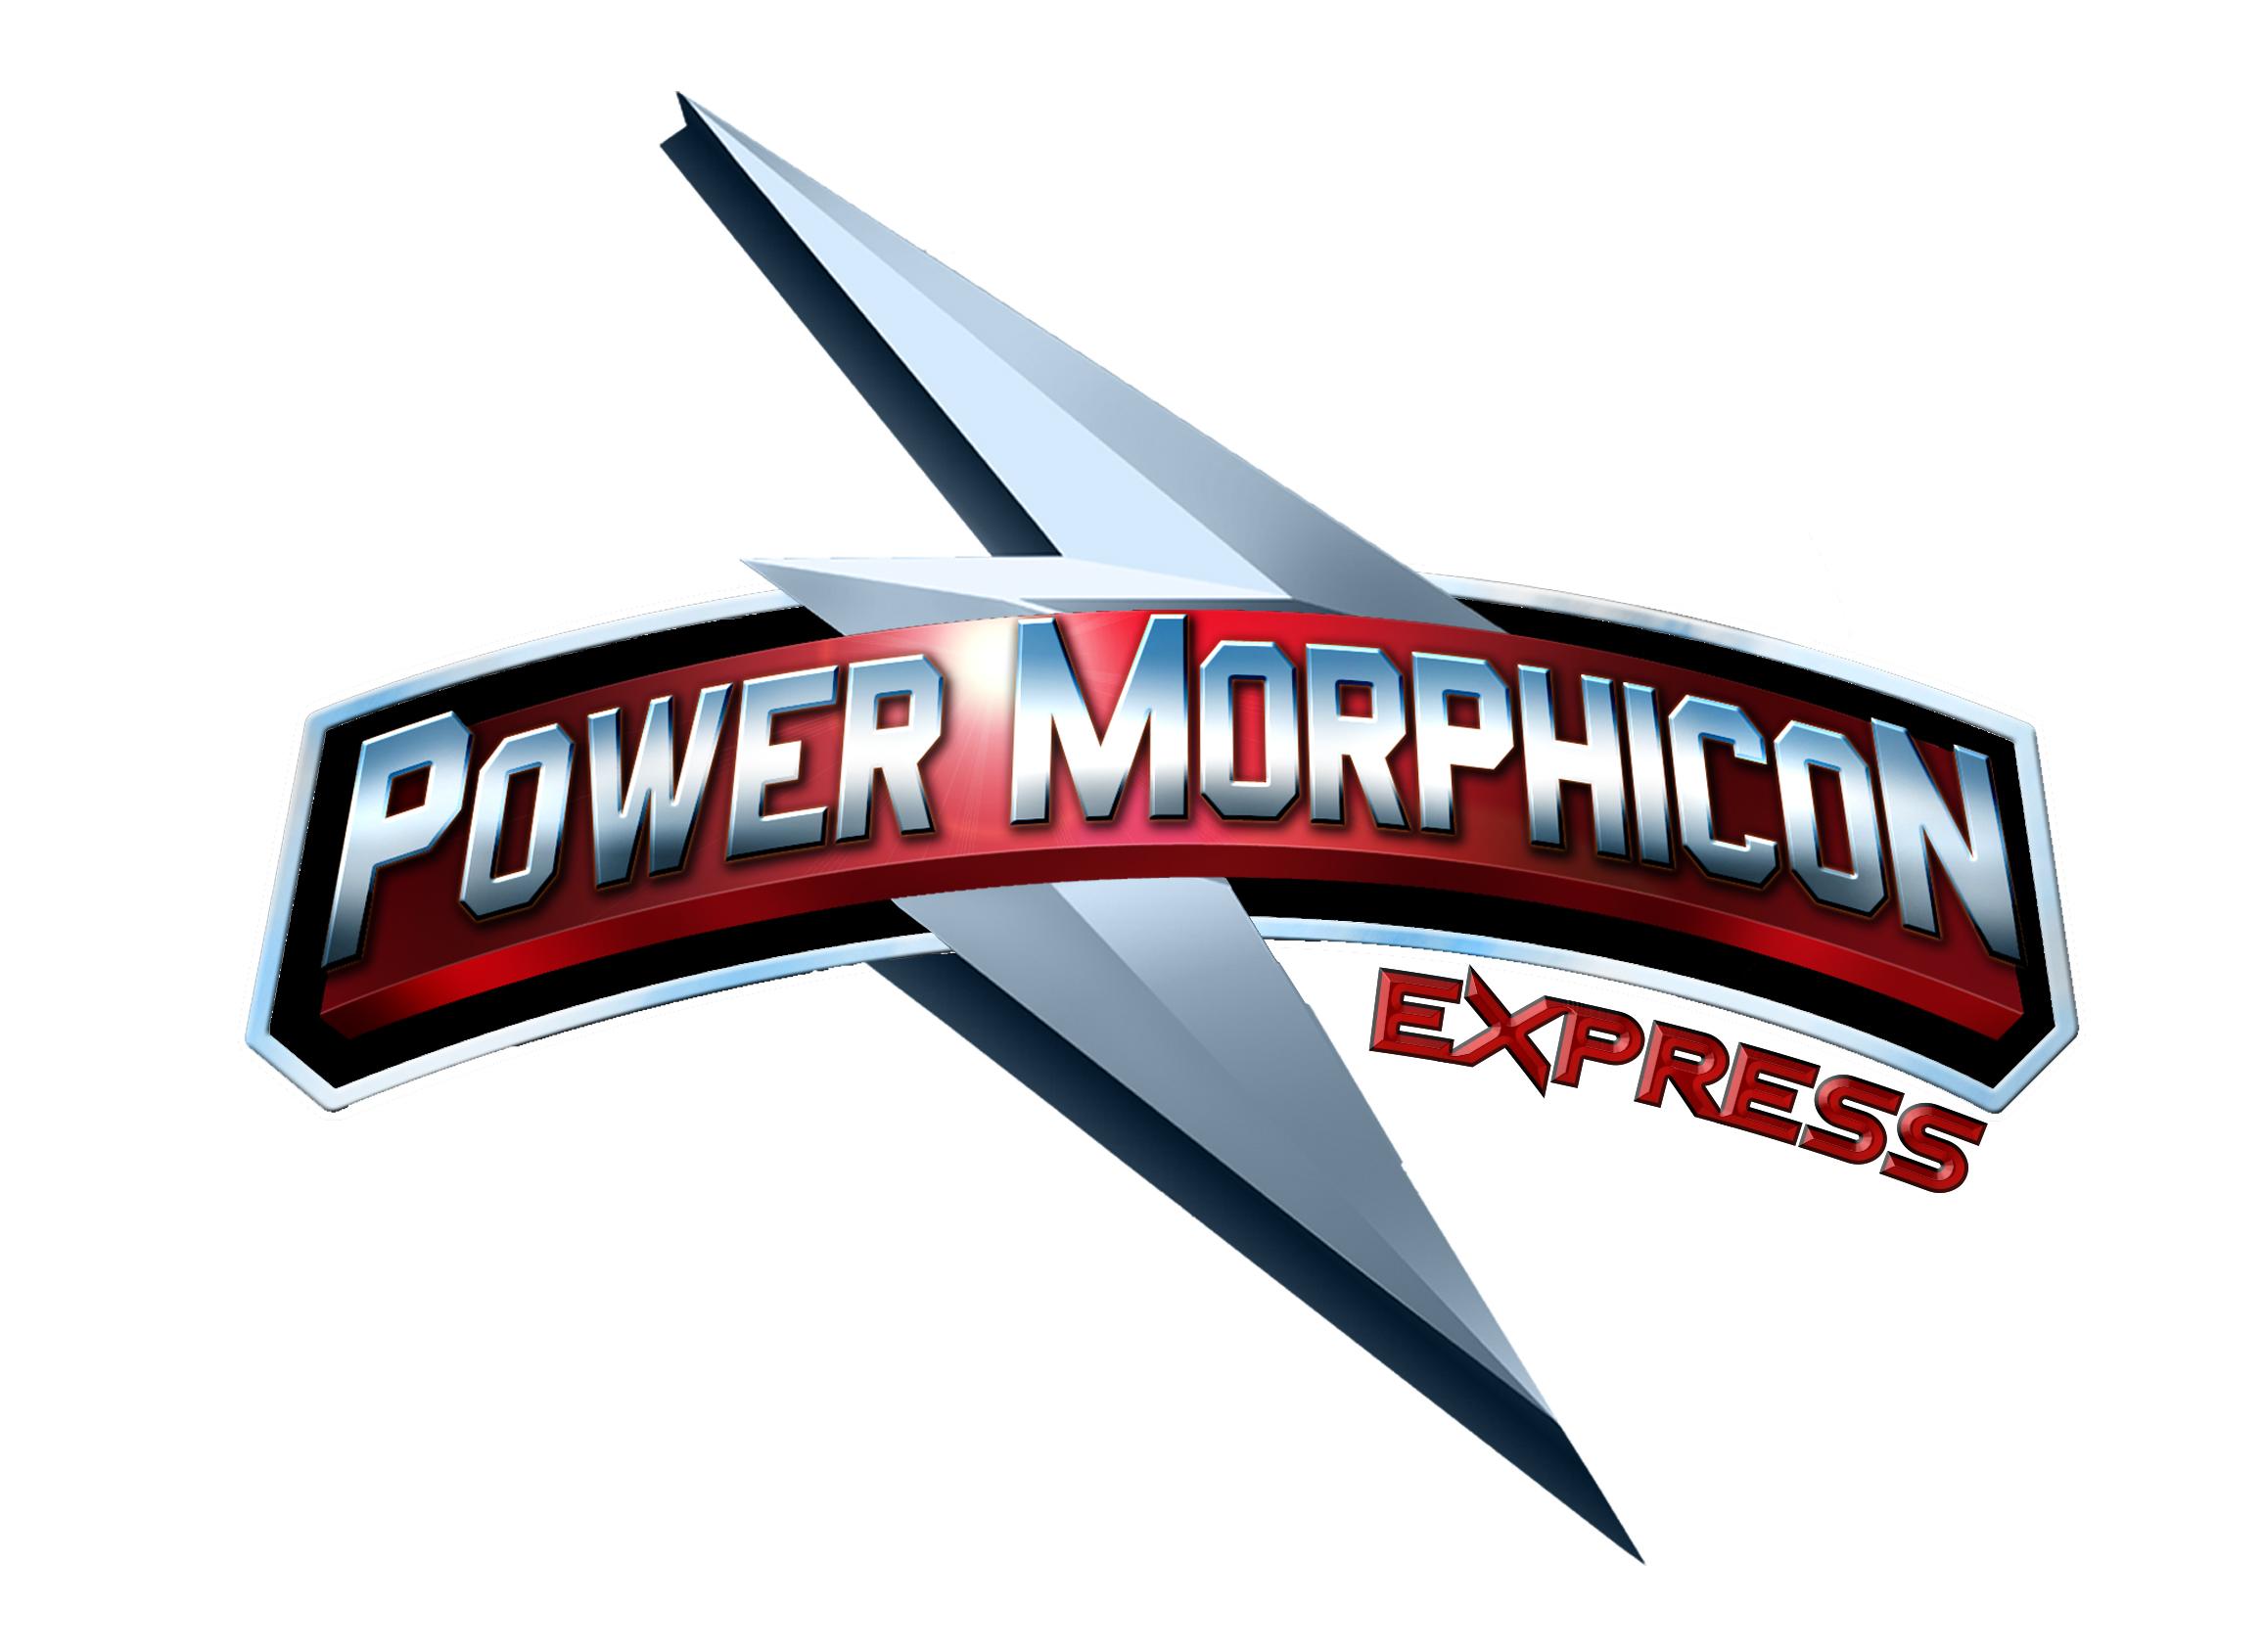 PMC EXPRESS LOGO (1) copy